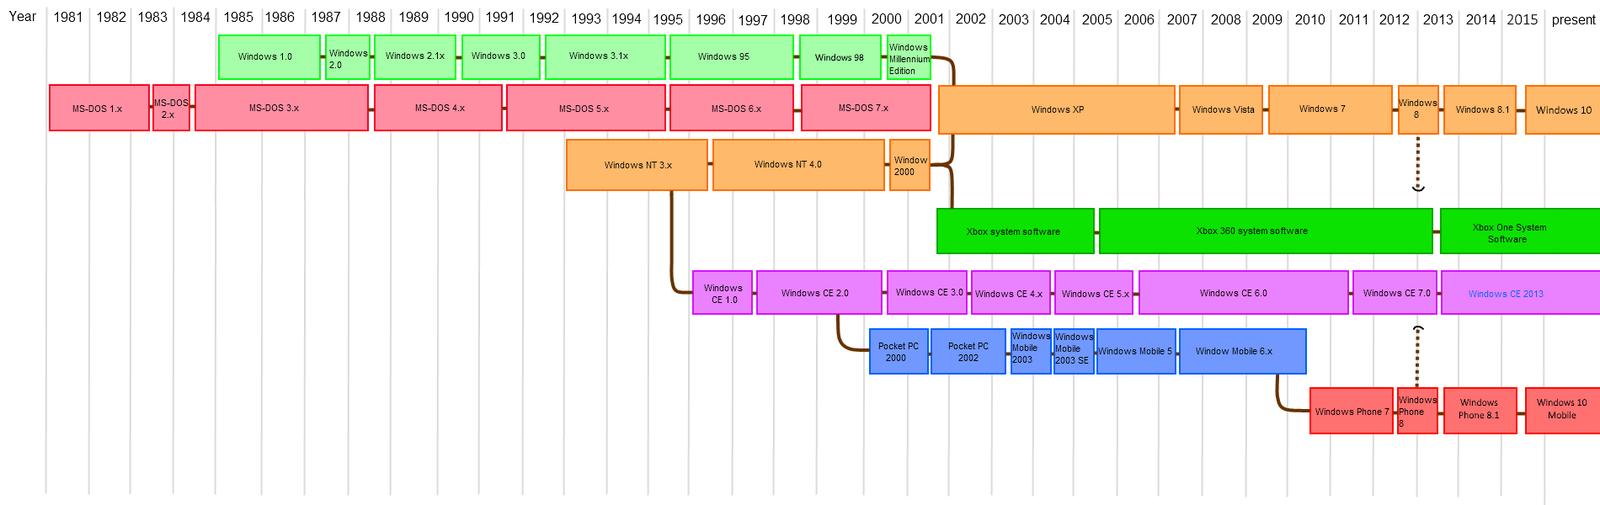 microsoft windows enterprise edition